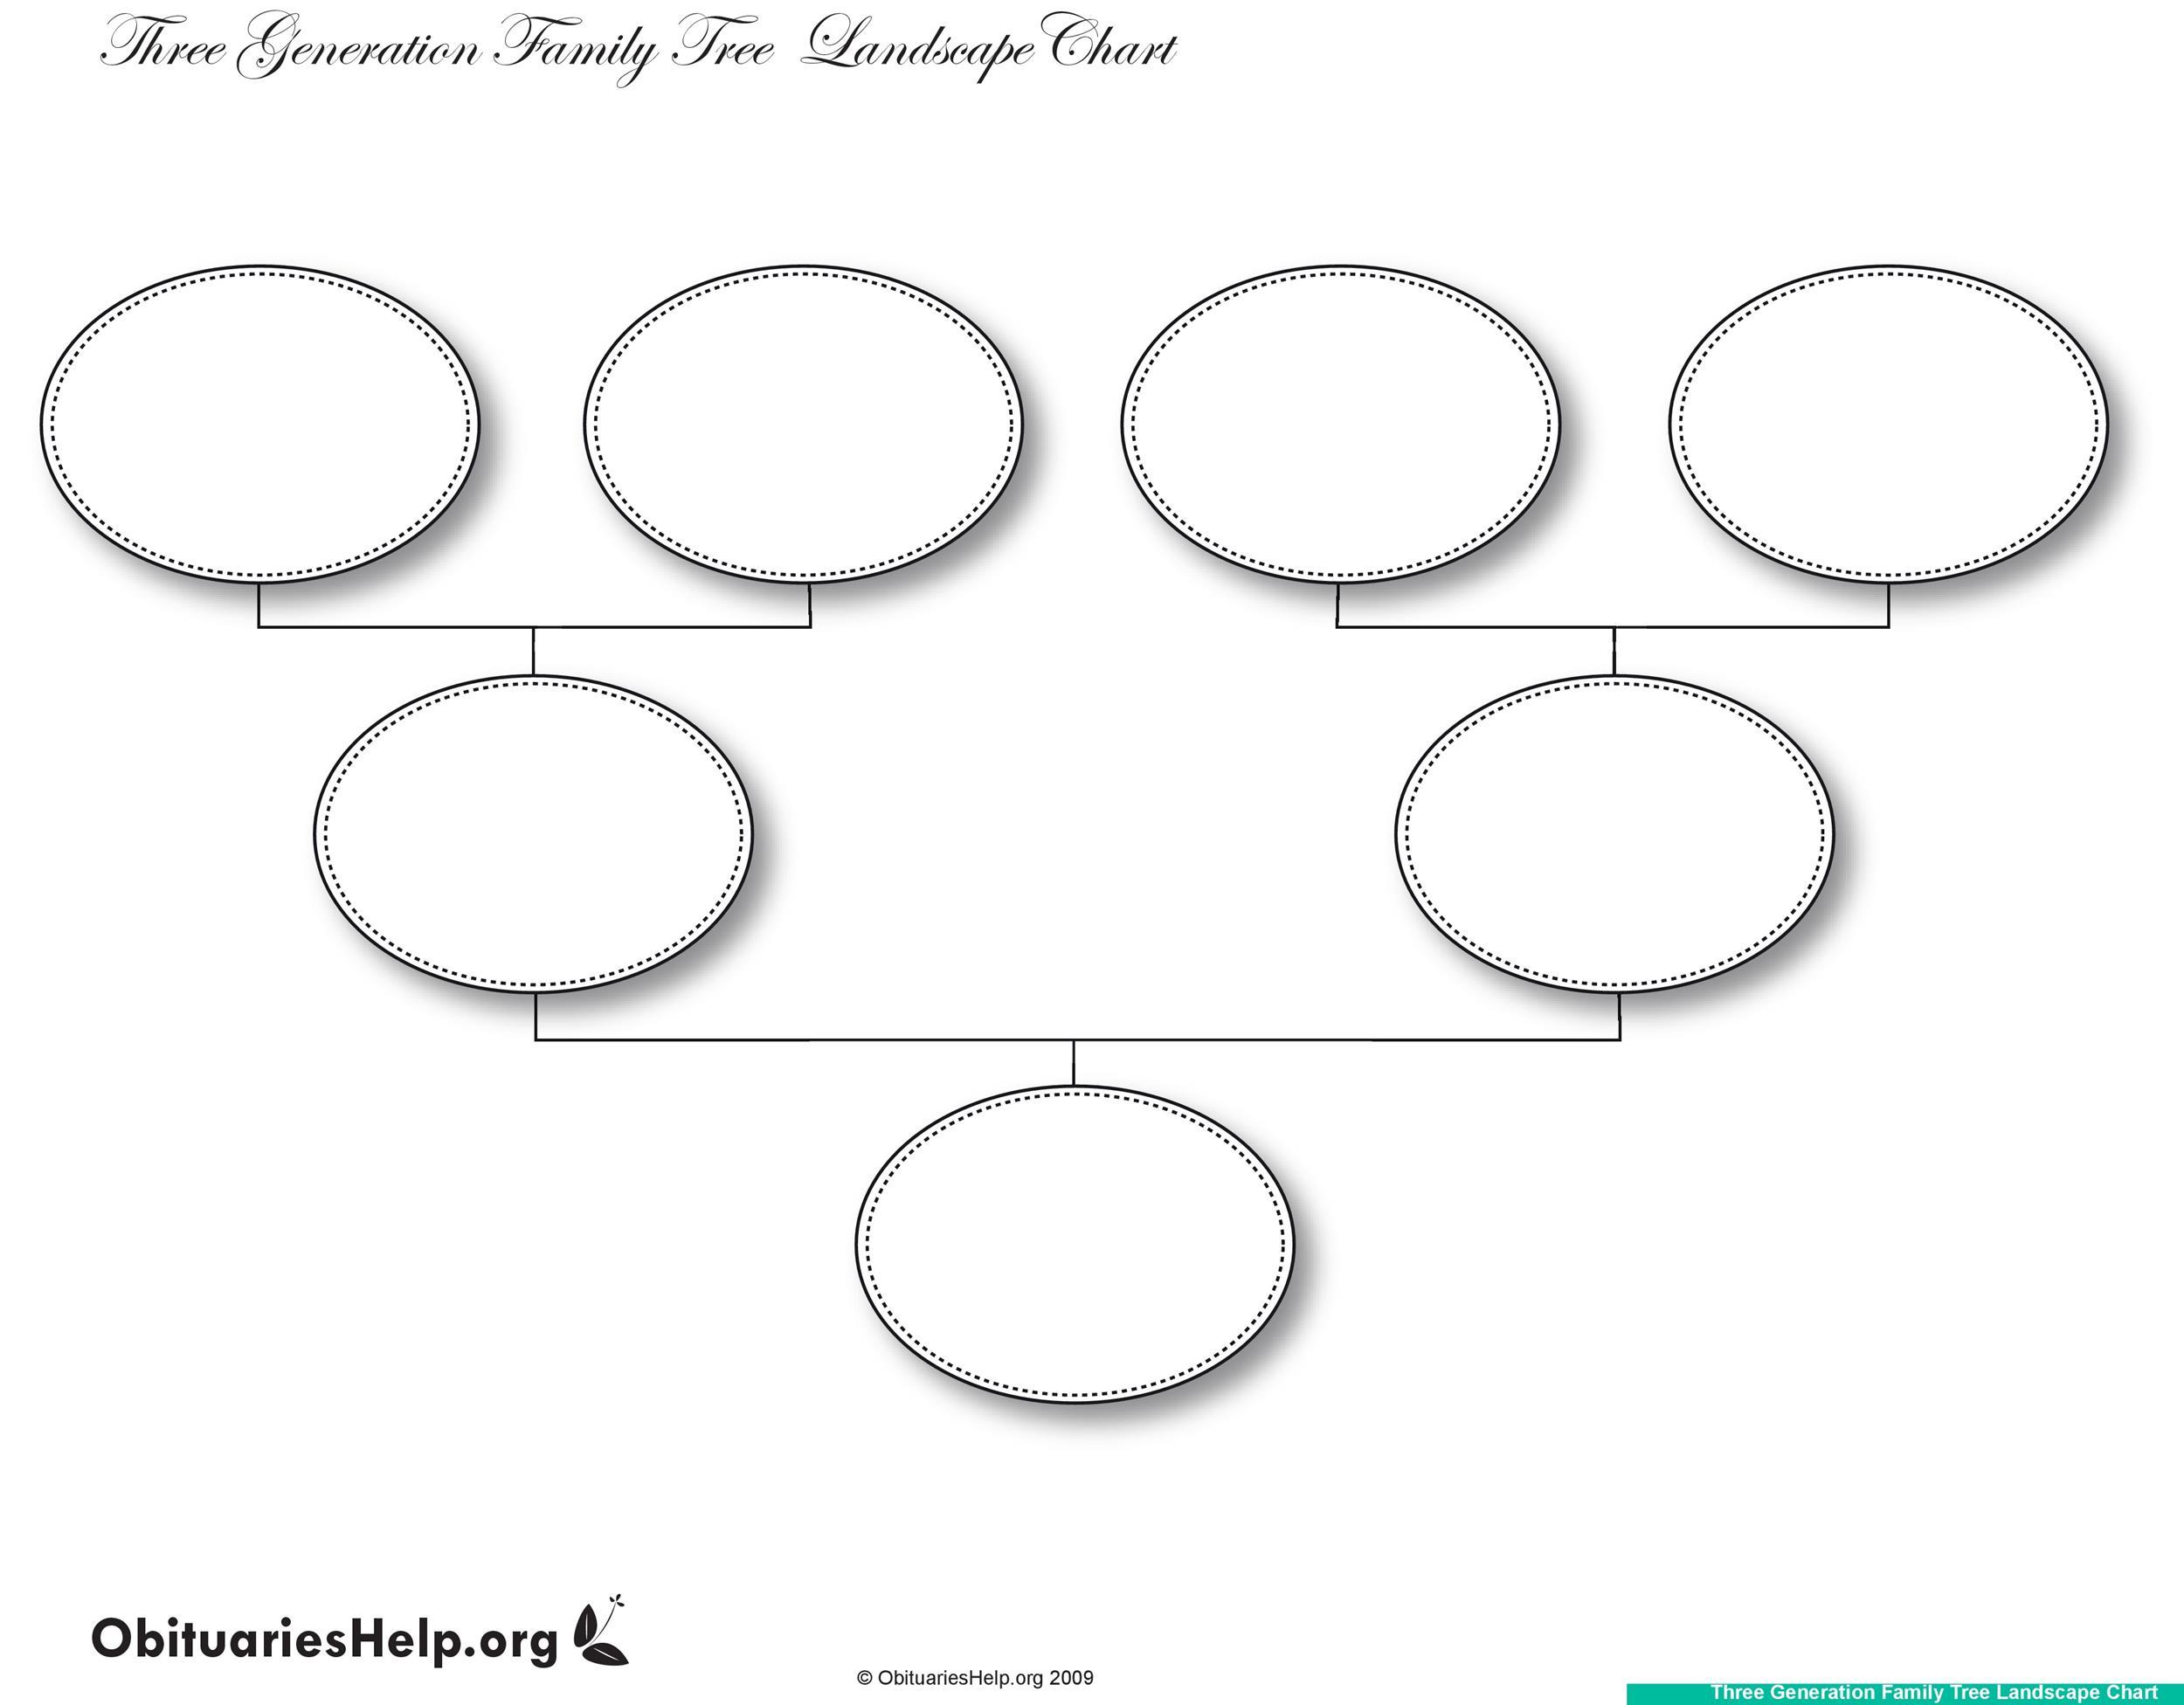 50+ Free Family Tree Templates (Word, Excel, PDF